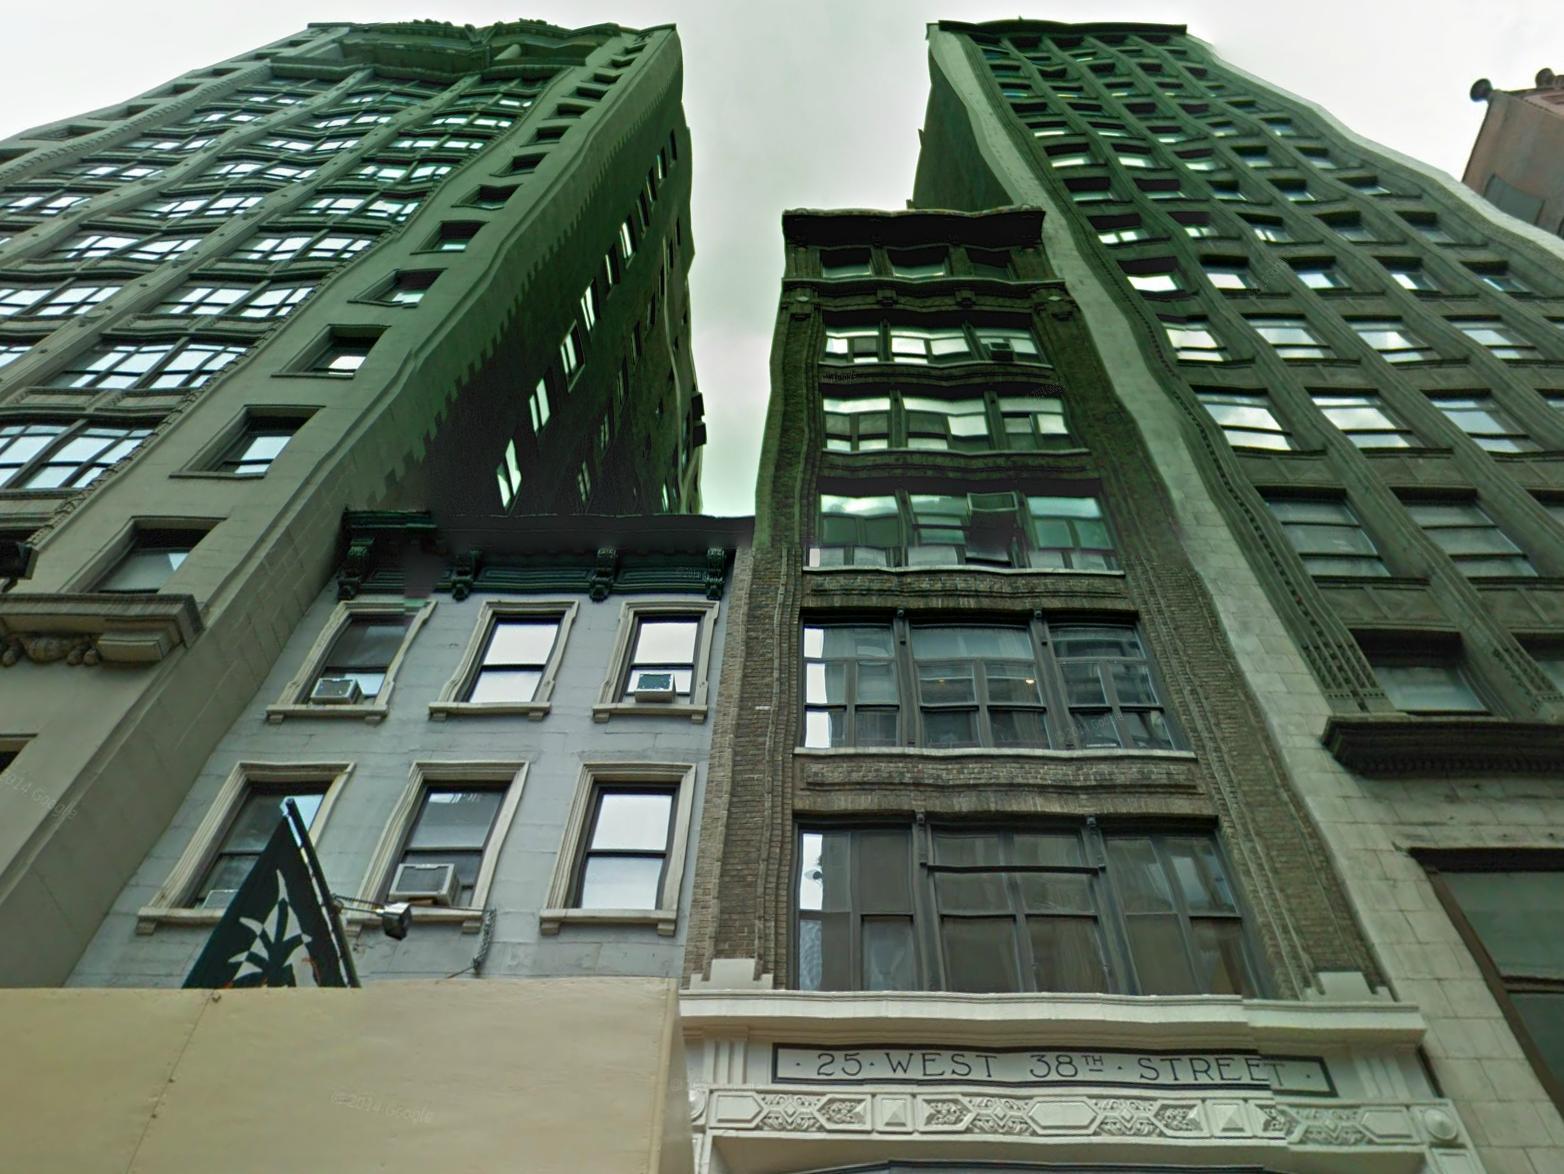 25 West 38th Street